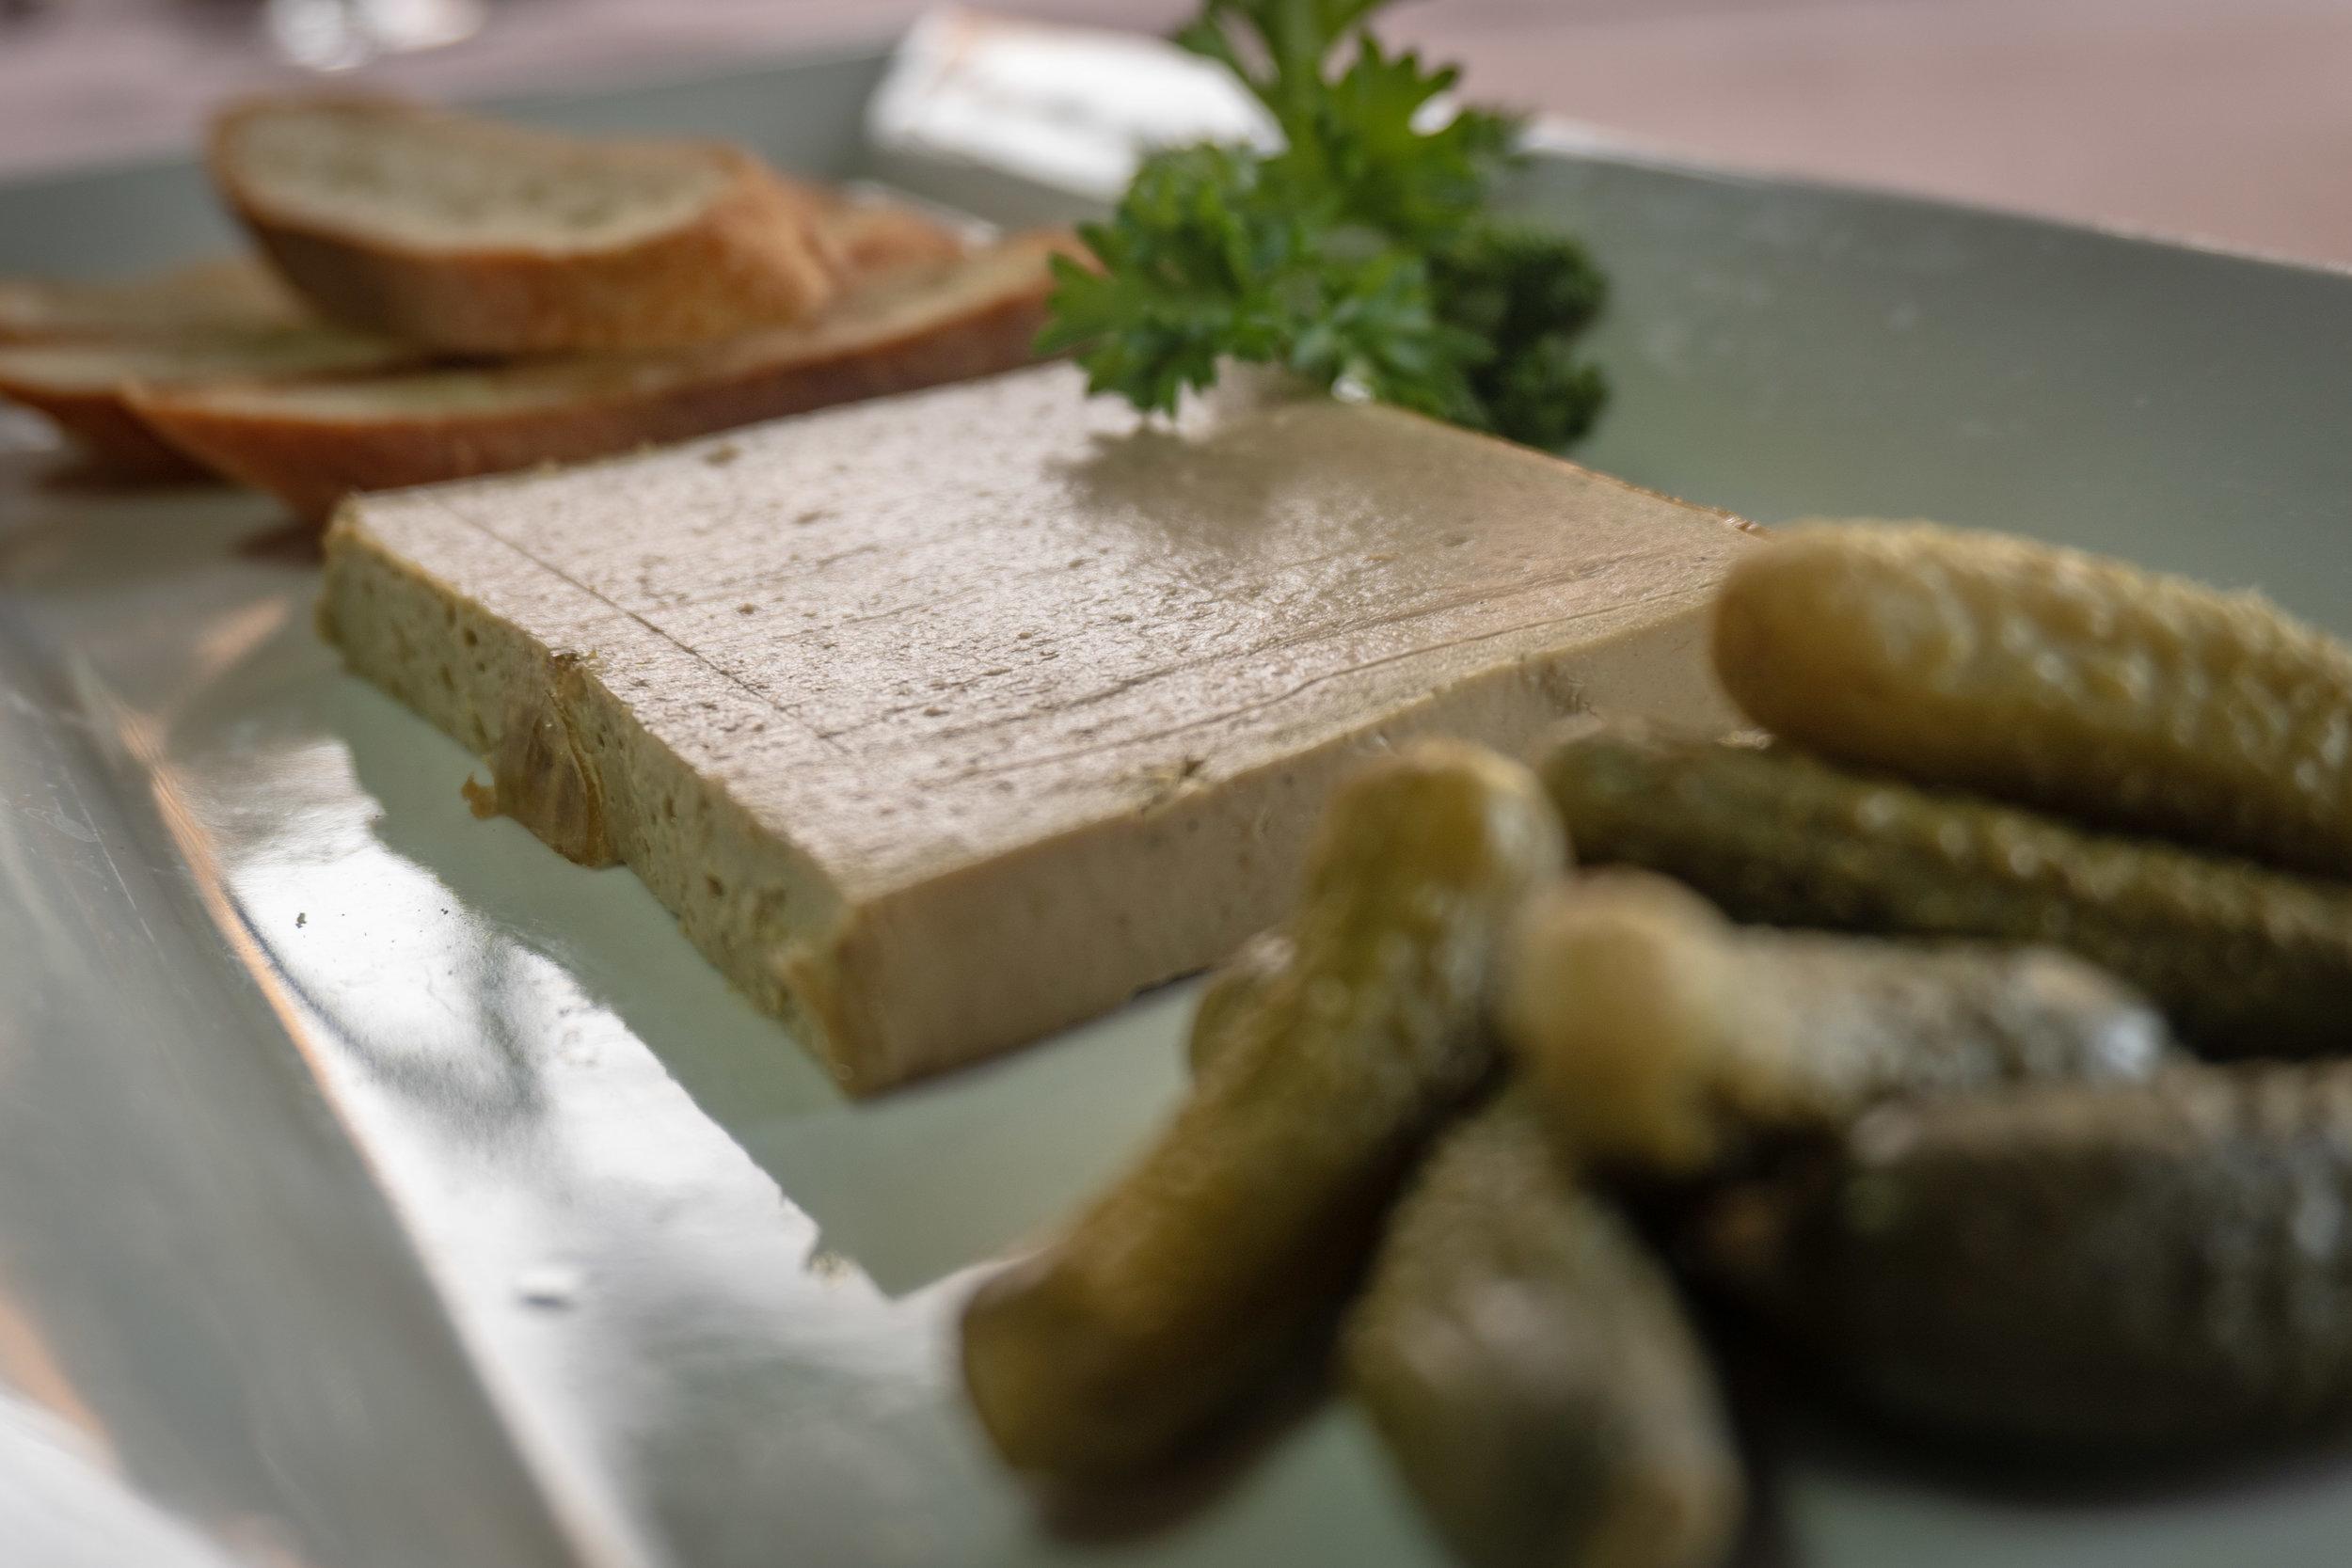 Le Pâté de Canard, Cornichons & Toasted Baguette